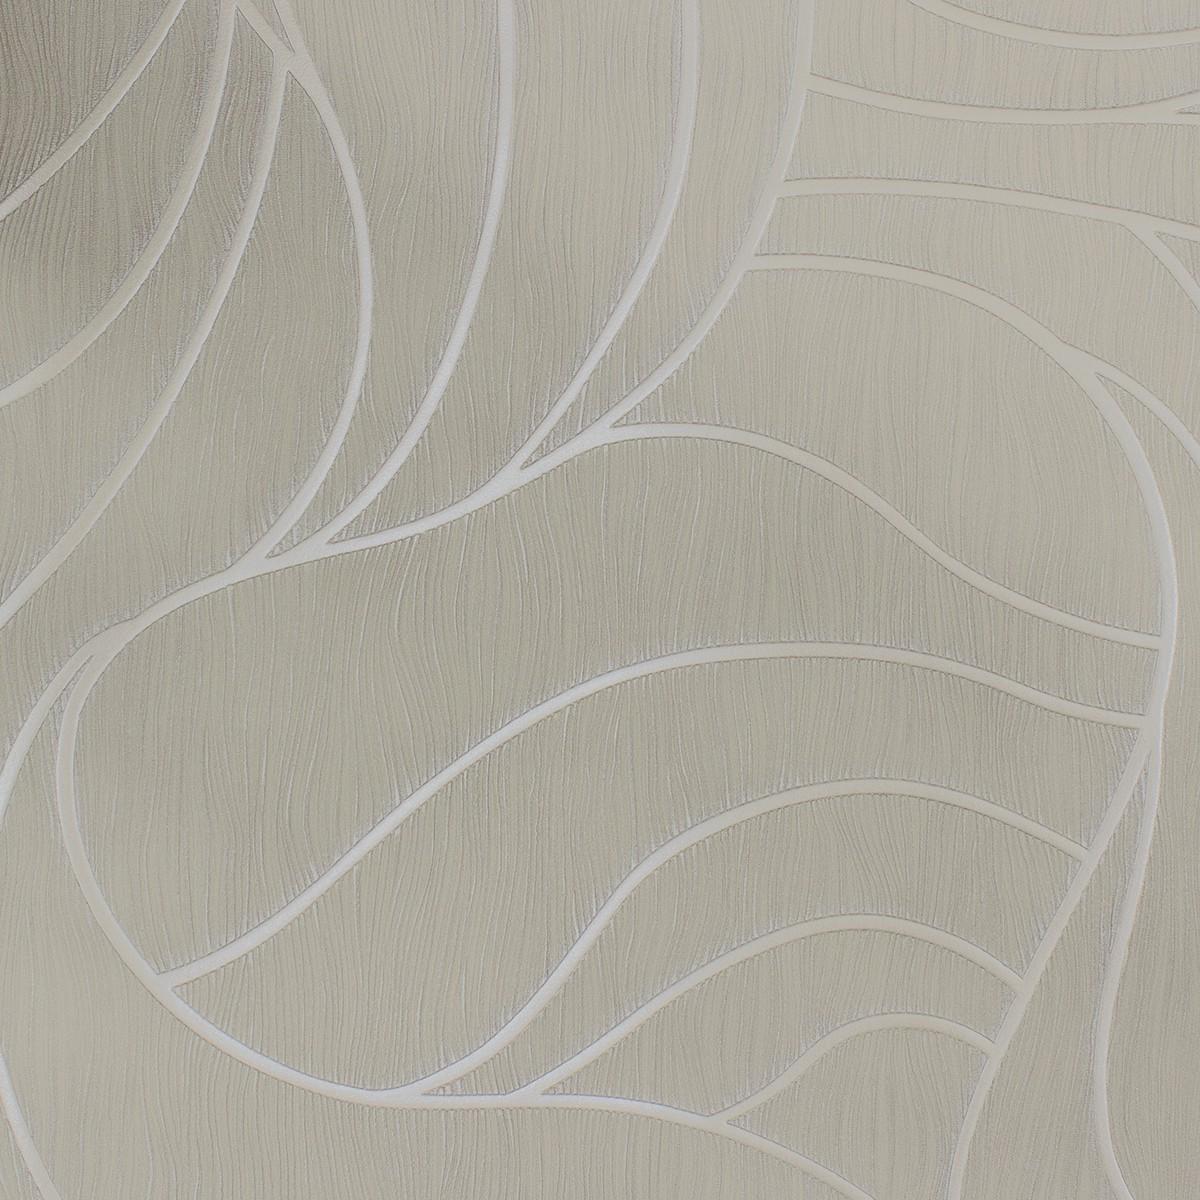 vliestapete luigi colani grafisch creme grau 53345. Black Bedroom Furniture Sets. Home Design Ideas